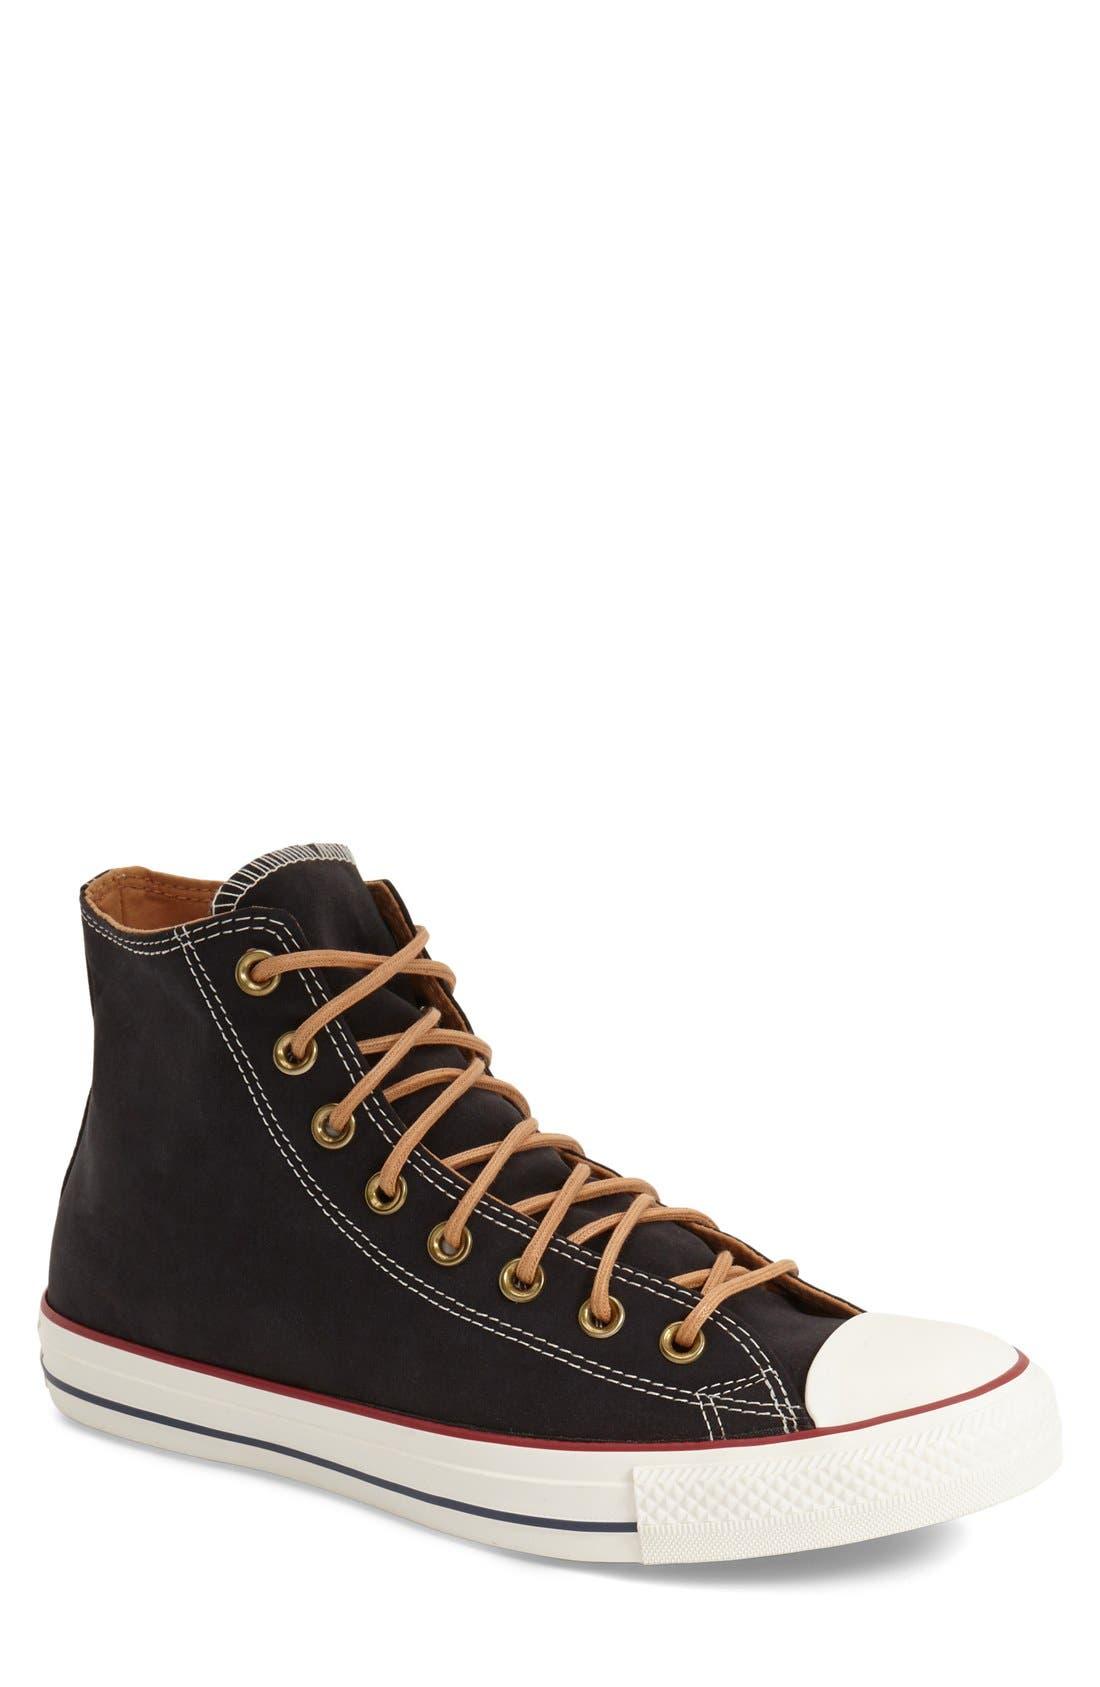 Main Image - Converse Chuck Taylor® All Star® High-Top Sneaker (Men)